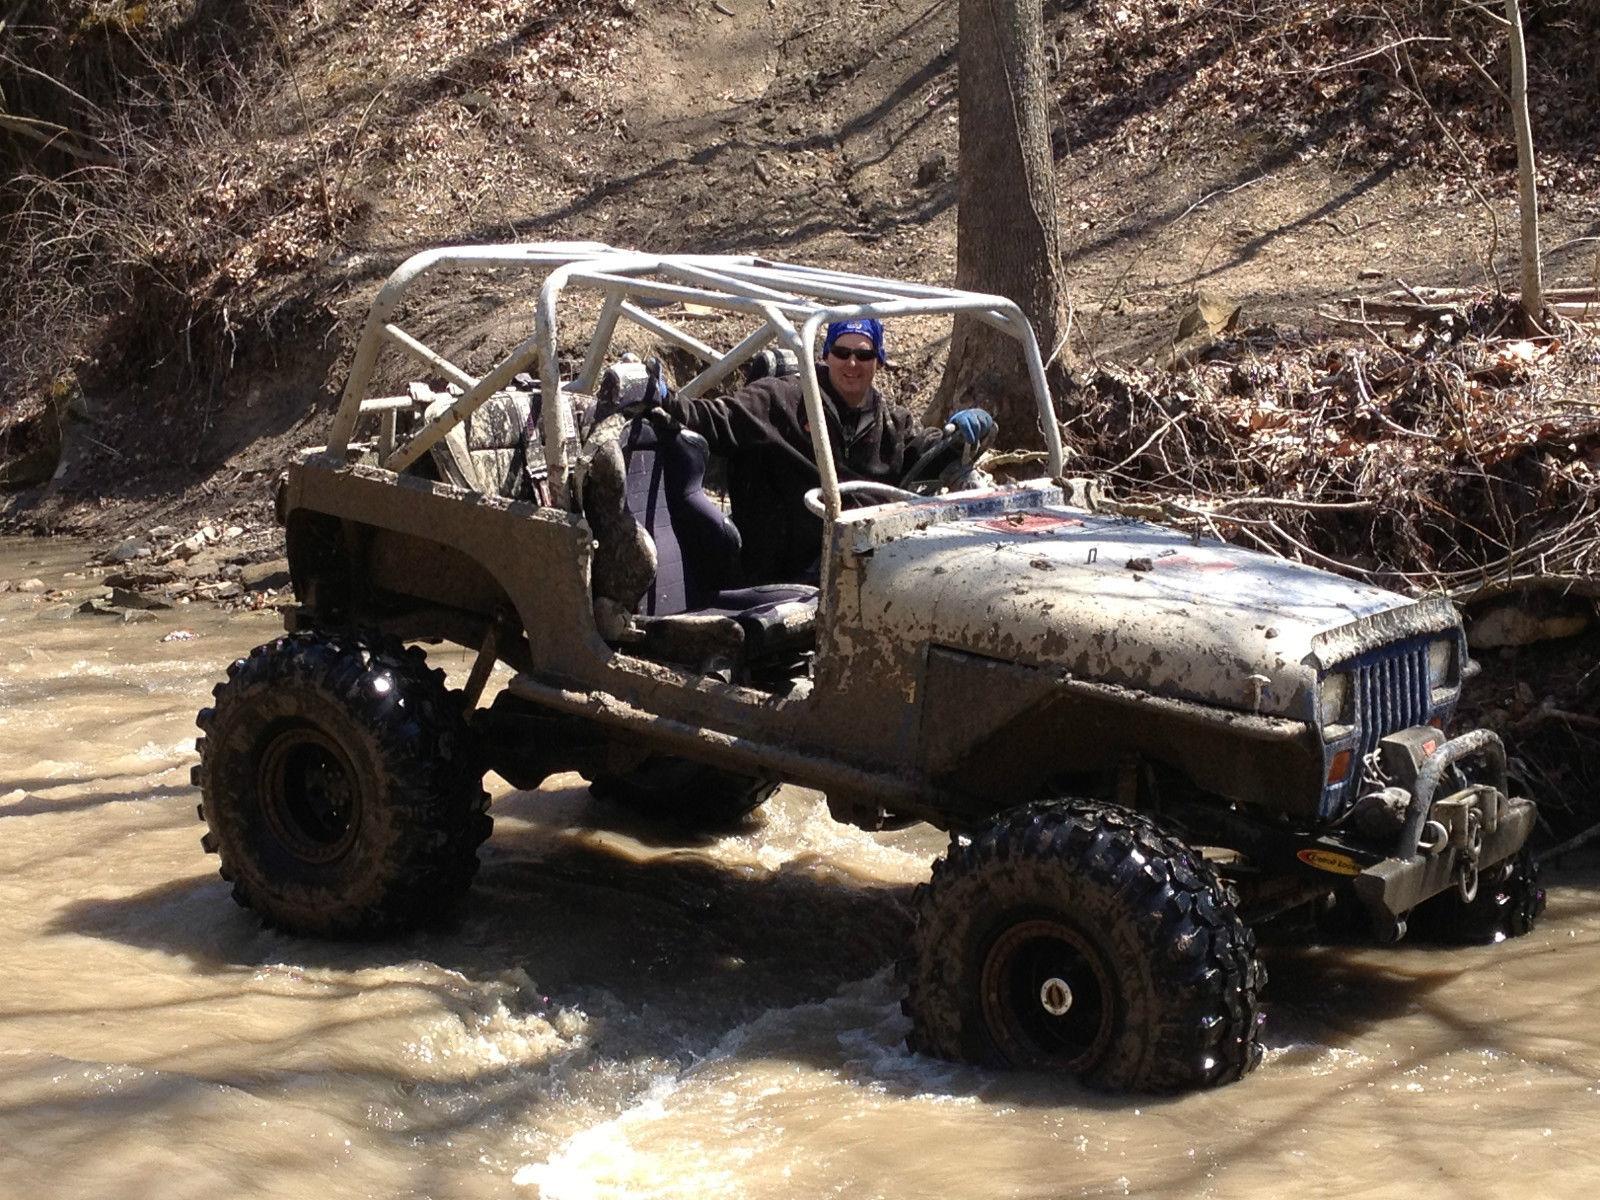 Jeep Rock Crawler 1989 Jeep Wrangler Rock Crawler Mud Truck Classic Jeep Wrangler